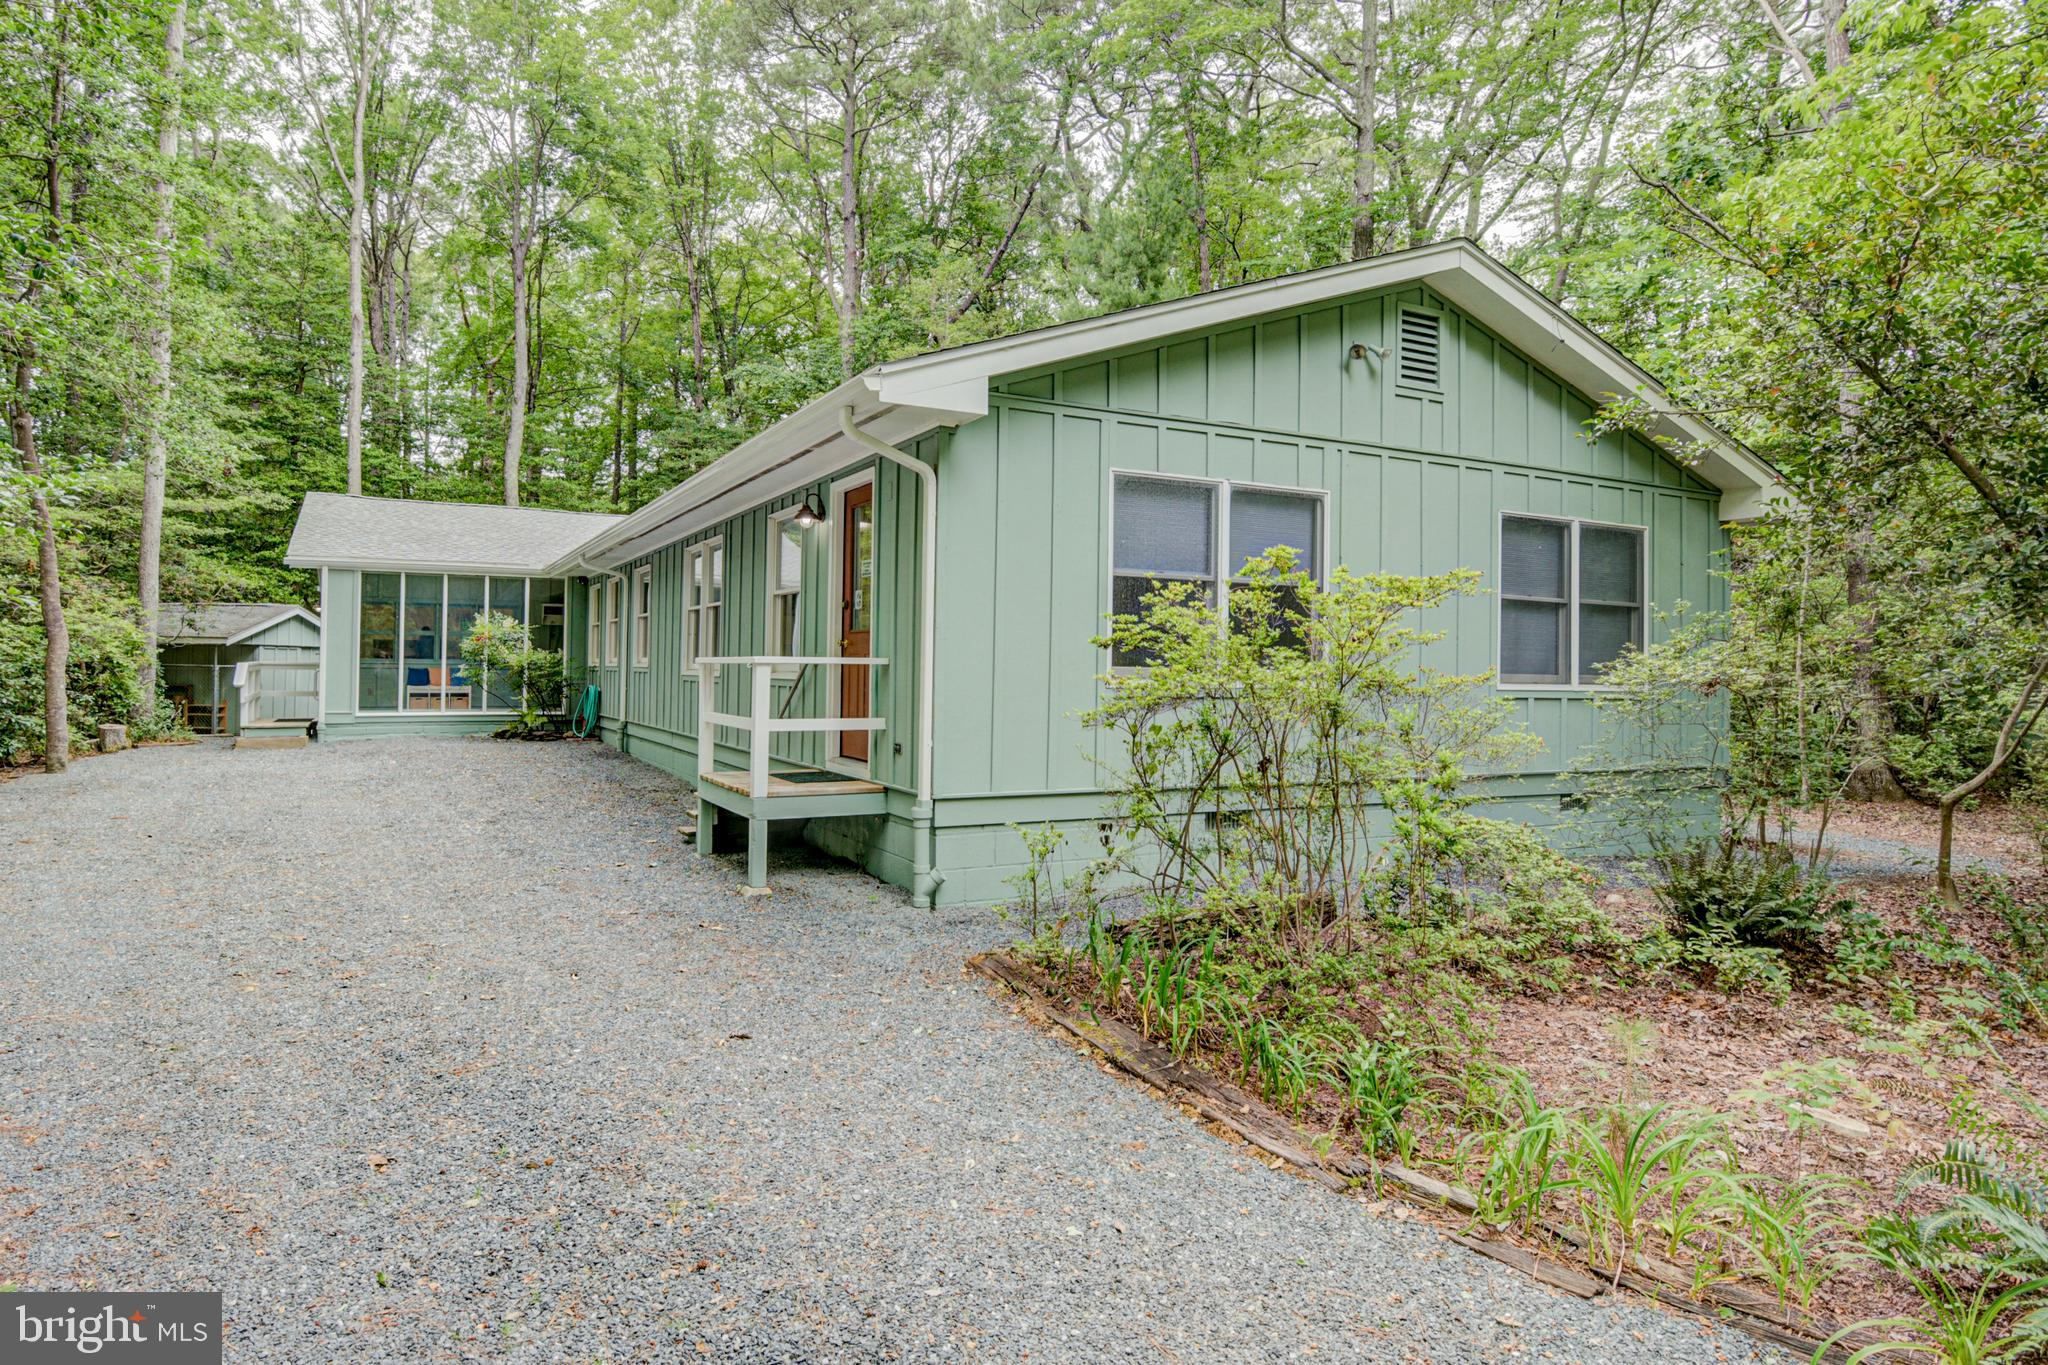 68 Pinehurst Rd, Ocean Pines, MD, 21811